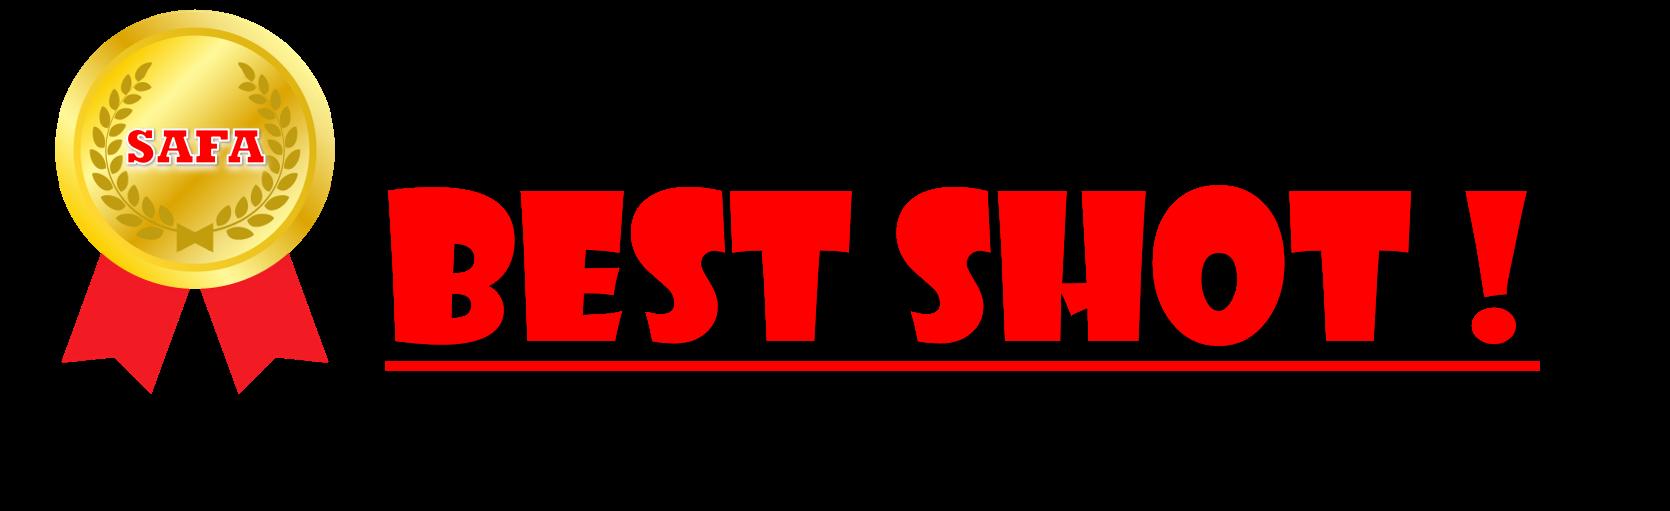 BEST SHOT!